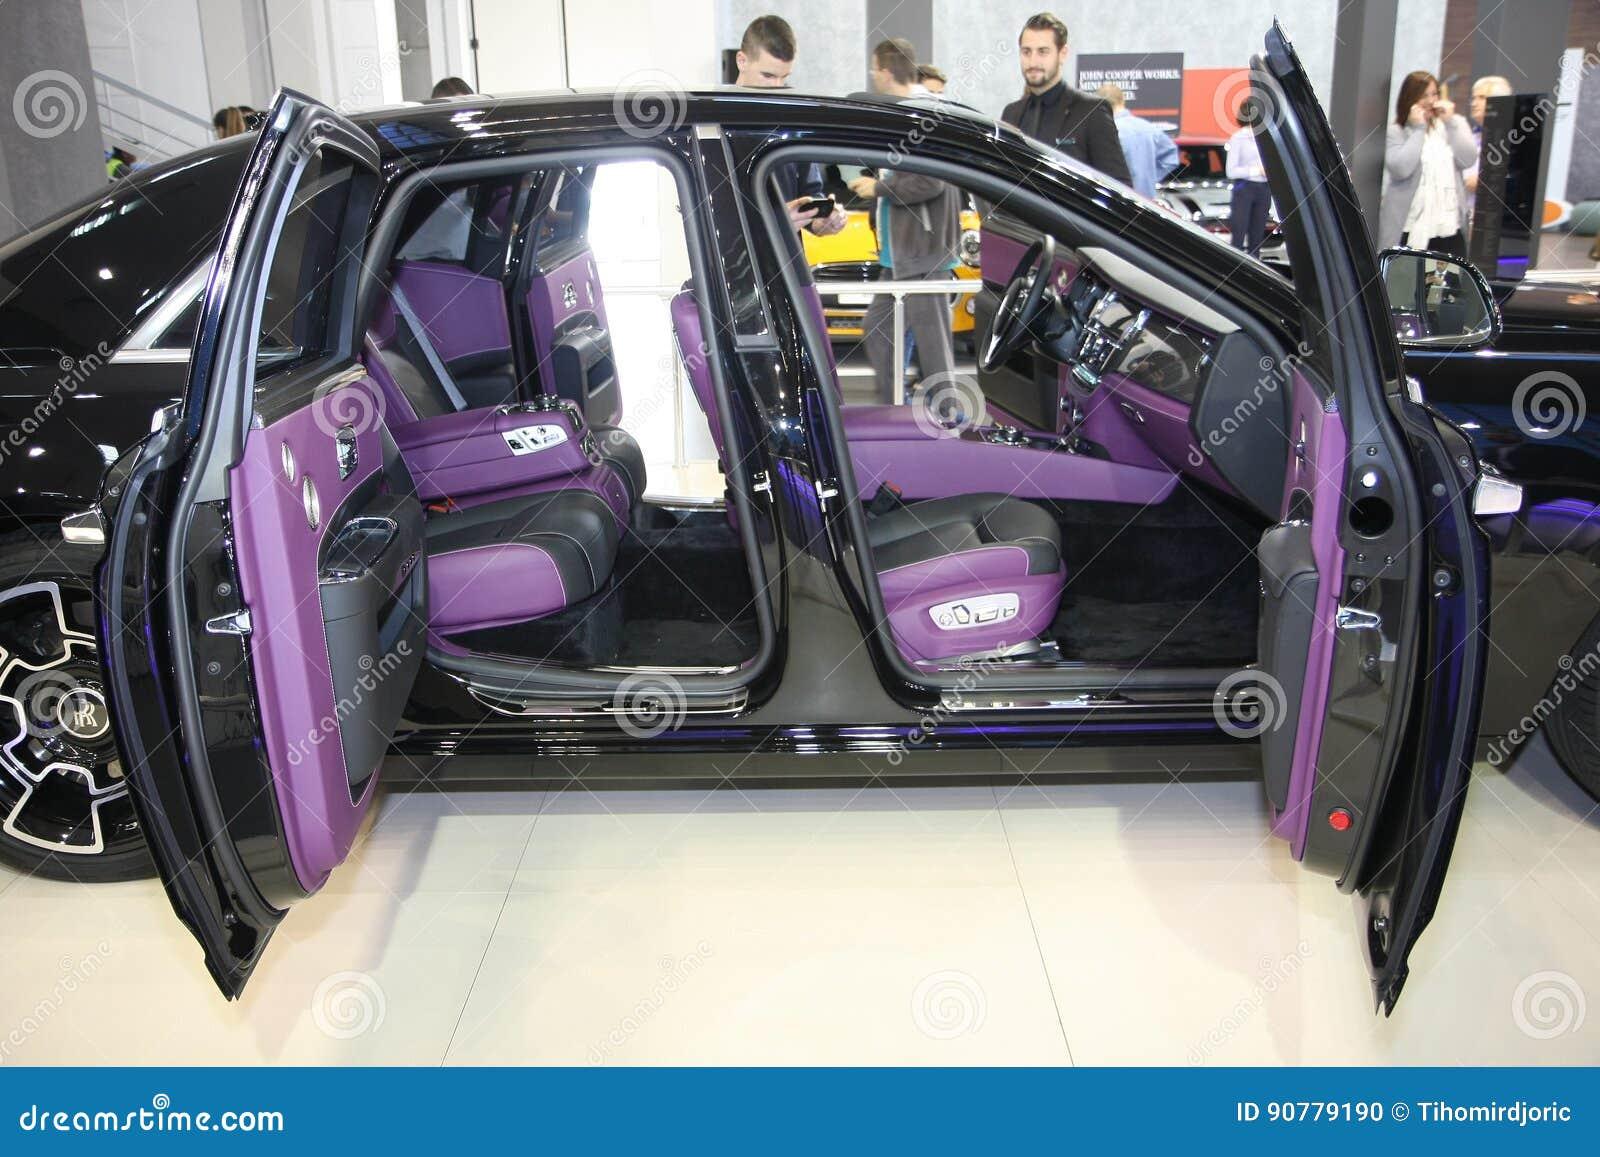 Rolls Royce At Belgrade Car Show Editorial Image Image Of Fair Technology 90779190